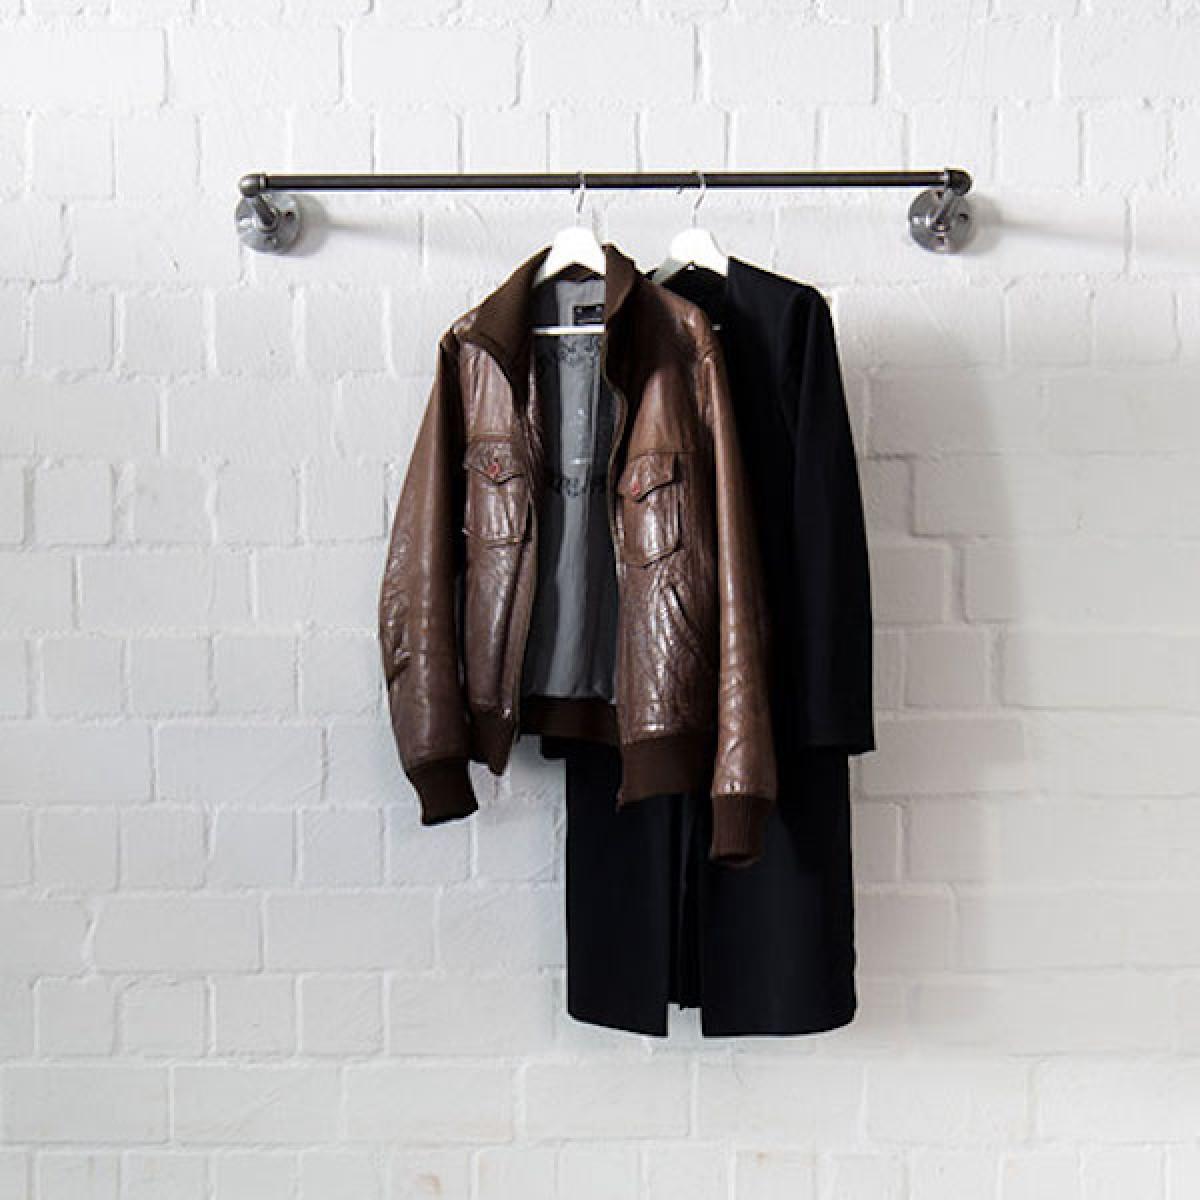 Industrial Style Kleiderstange · Wandgarderobe im Industriedesign SOLID LINE - Tiefe 12 cm